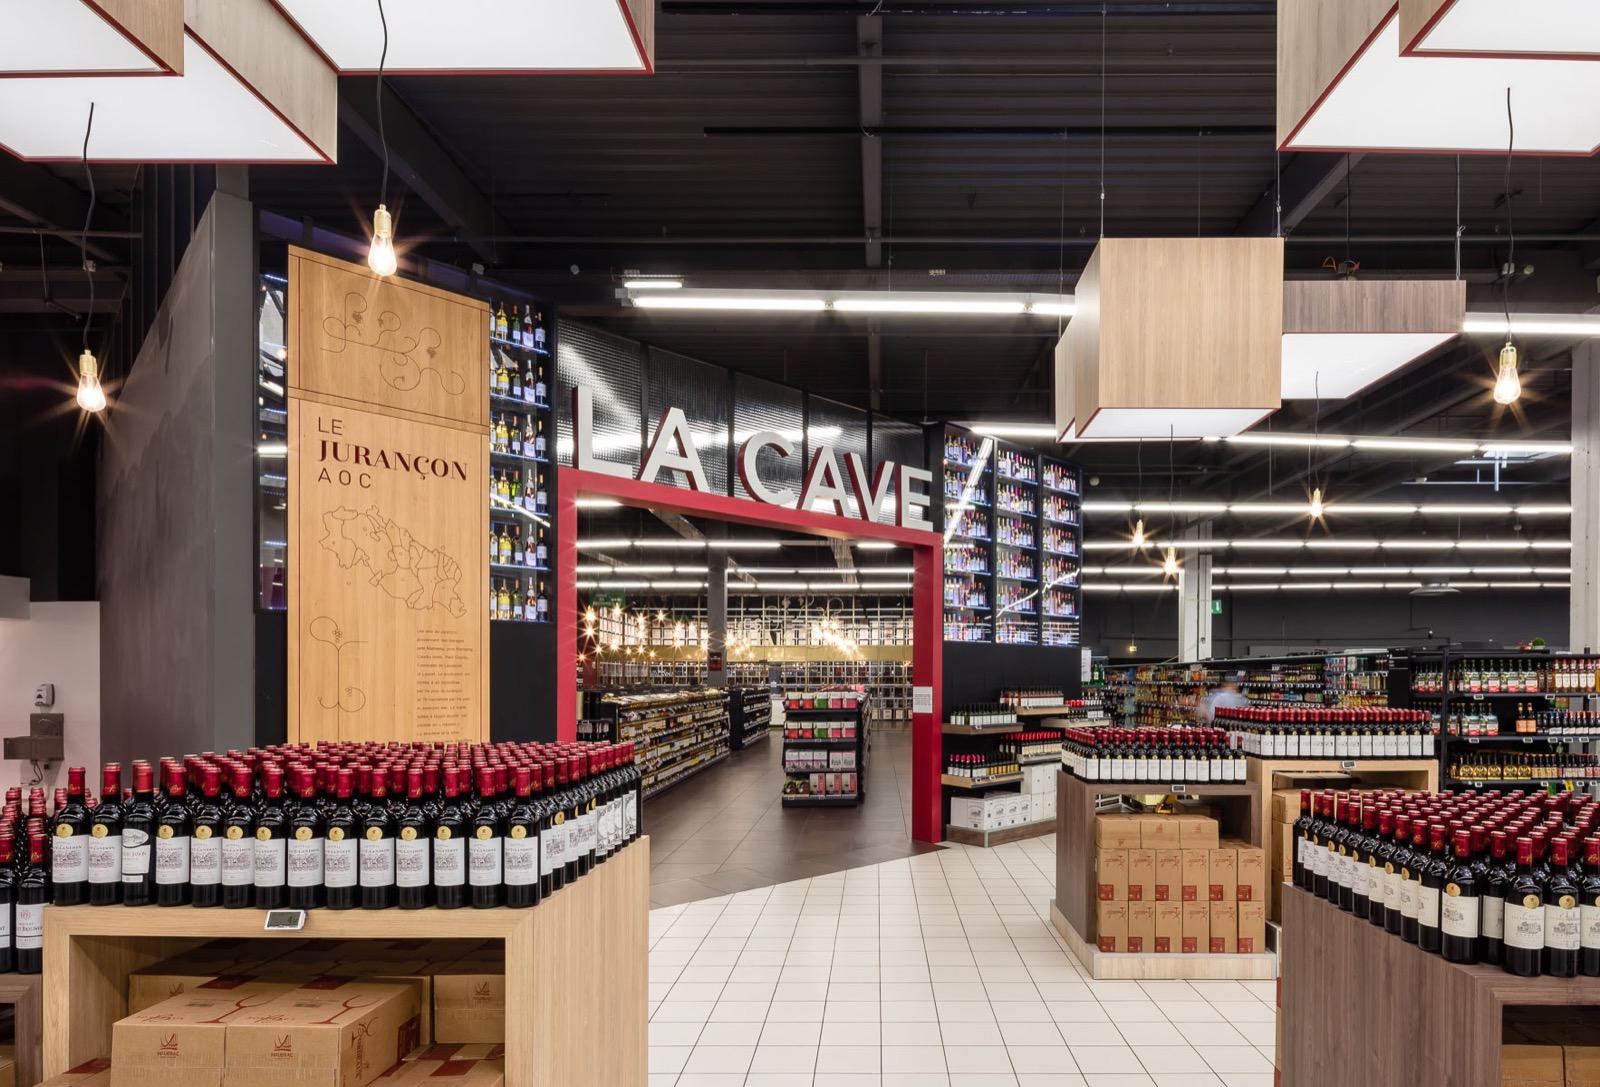 retail branding e leclerc pau agence dragon rouge. Black Bedroom Furniture Sets. Home Design Ideas